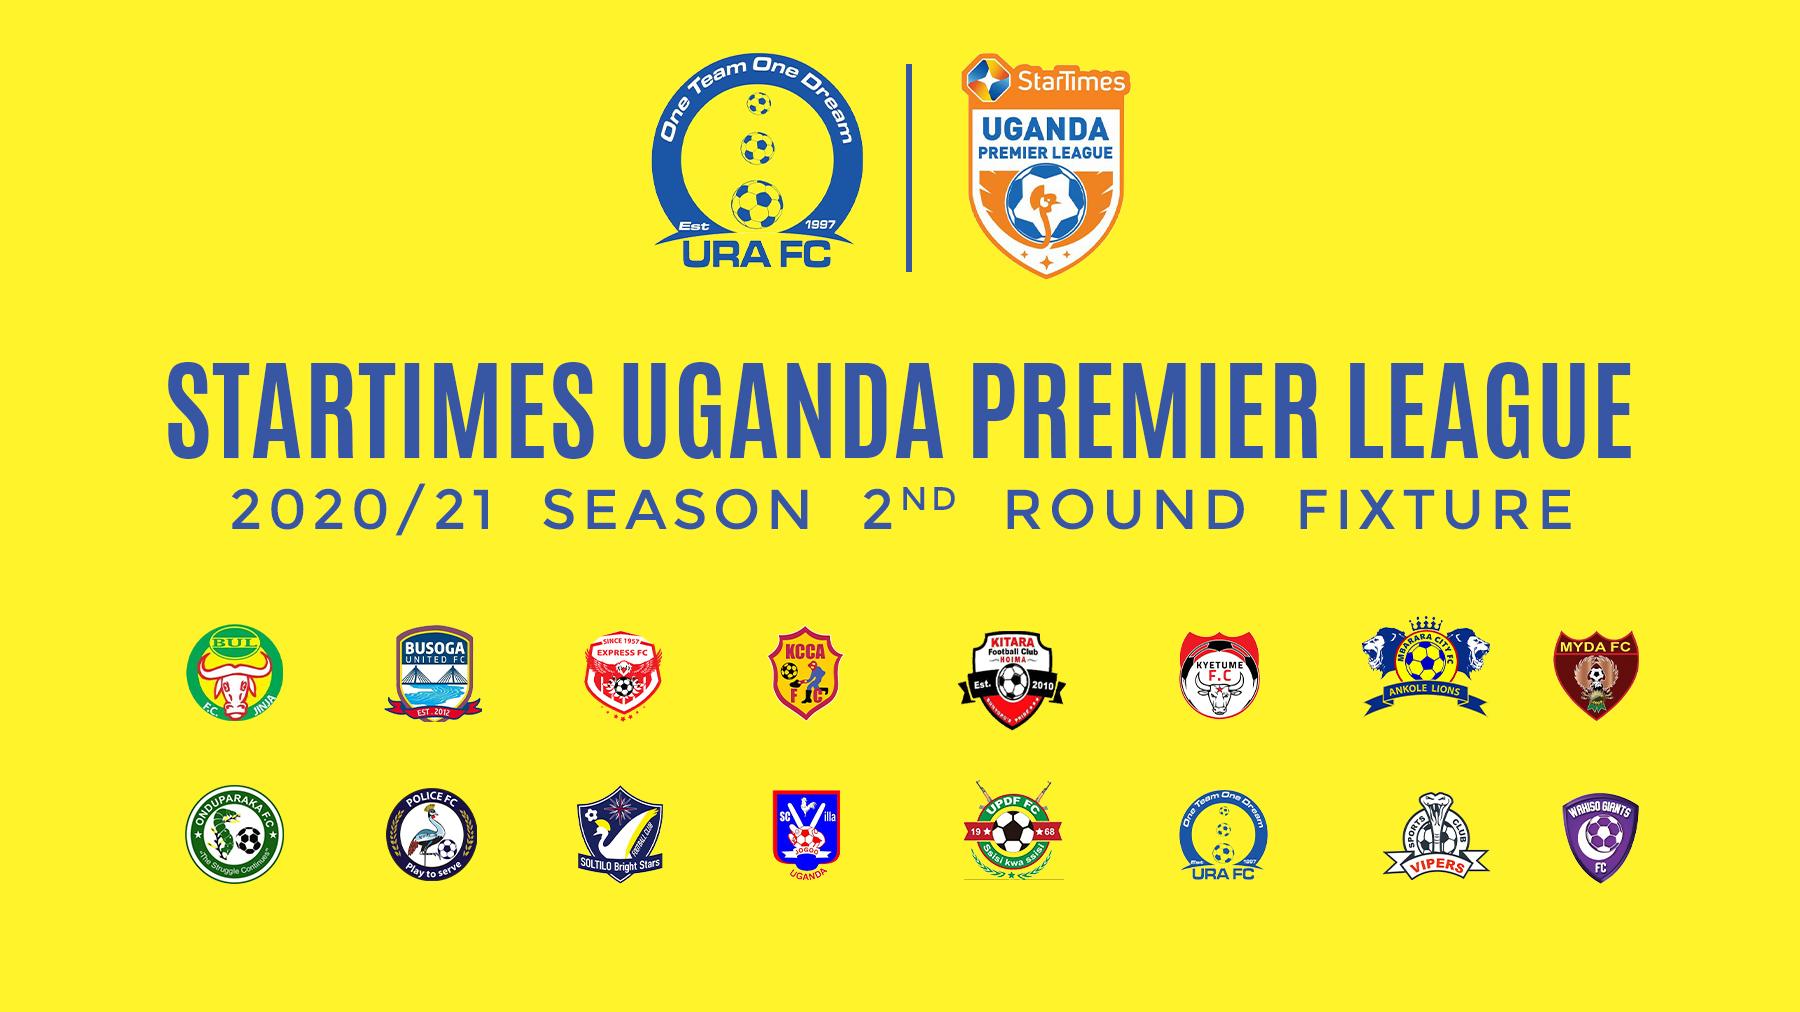 StarTimes Uganda Premier League 2020/21 2nd Round fixtures